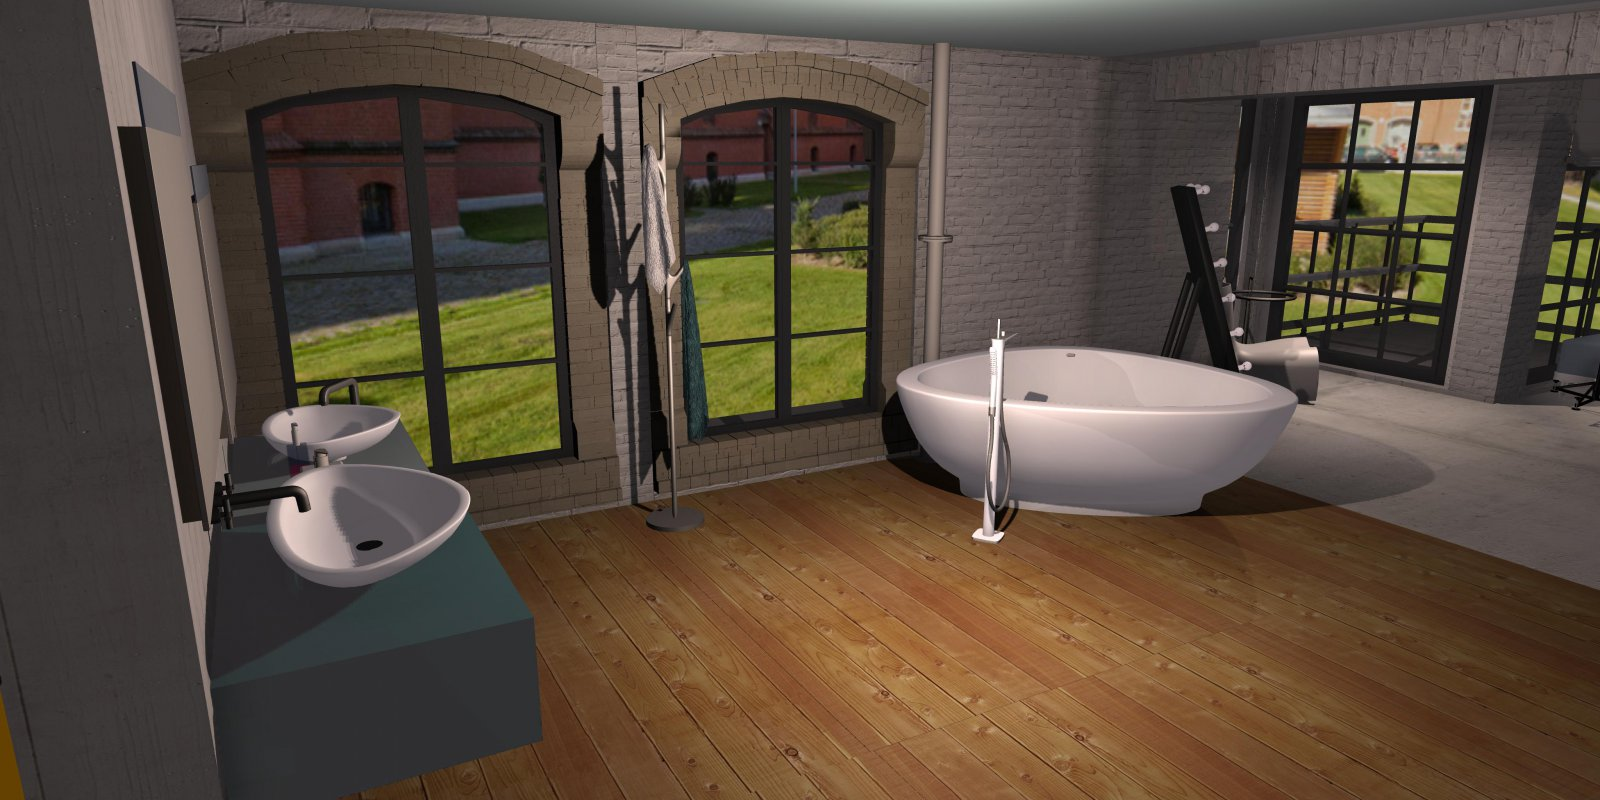 Raumplanung Loft Showroom Bad - roomeon Community